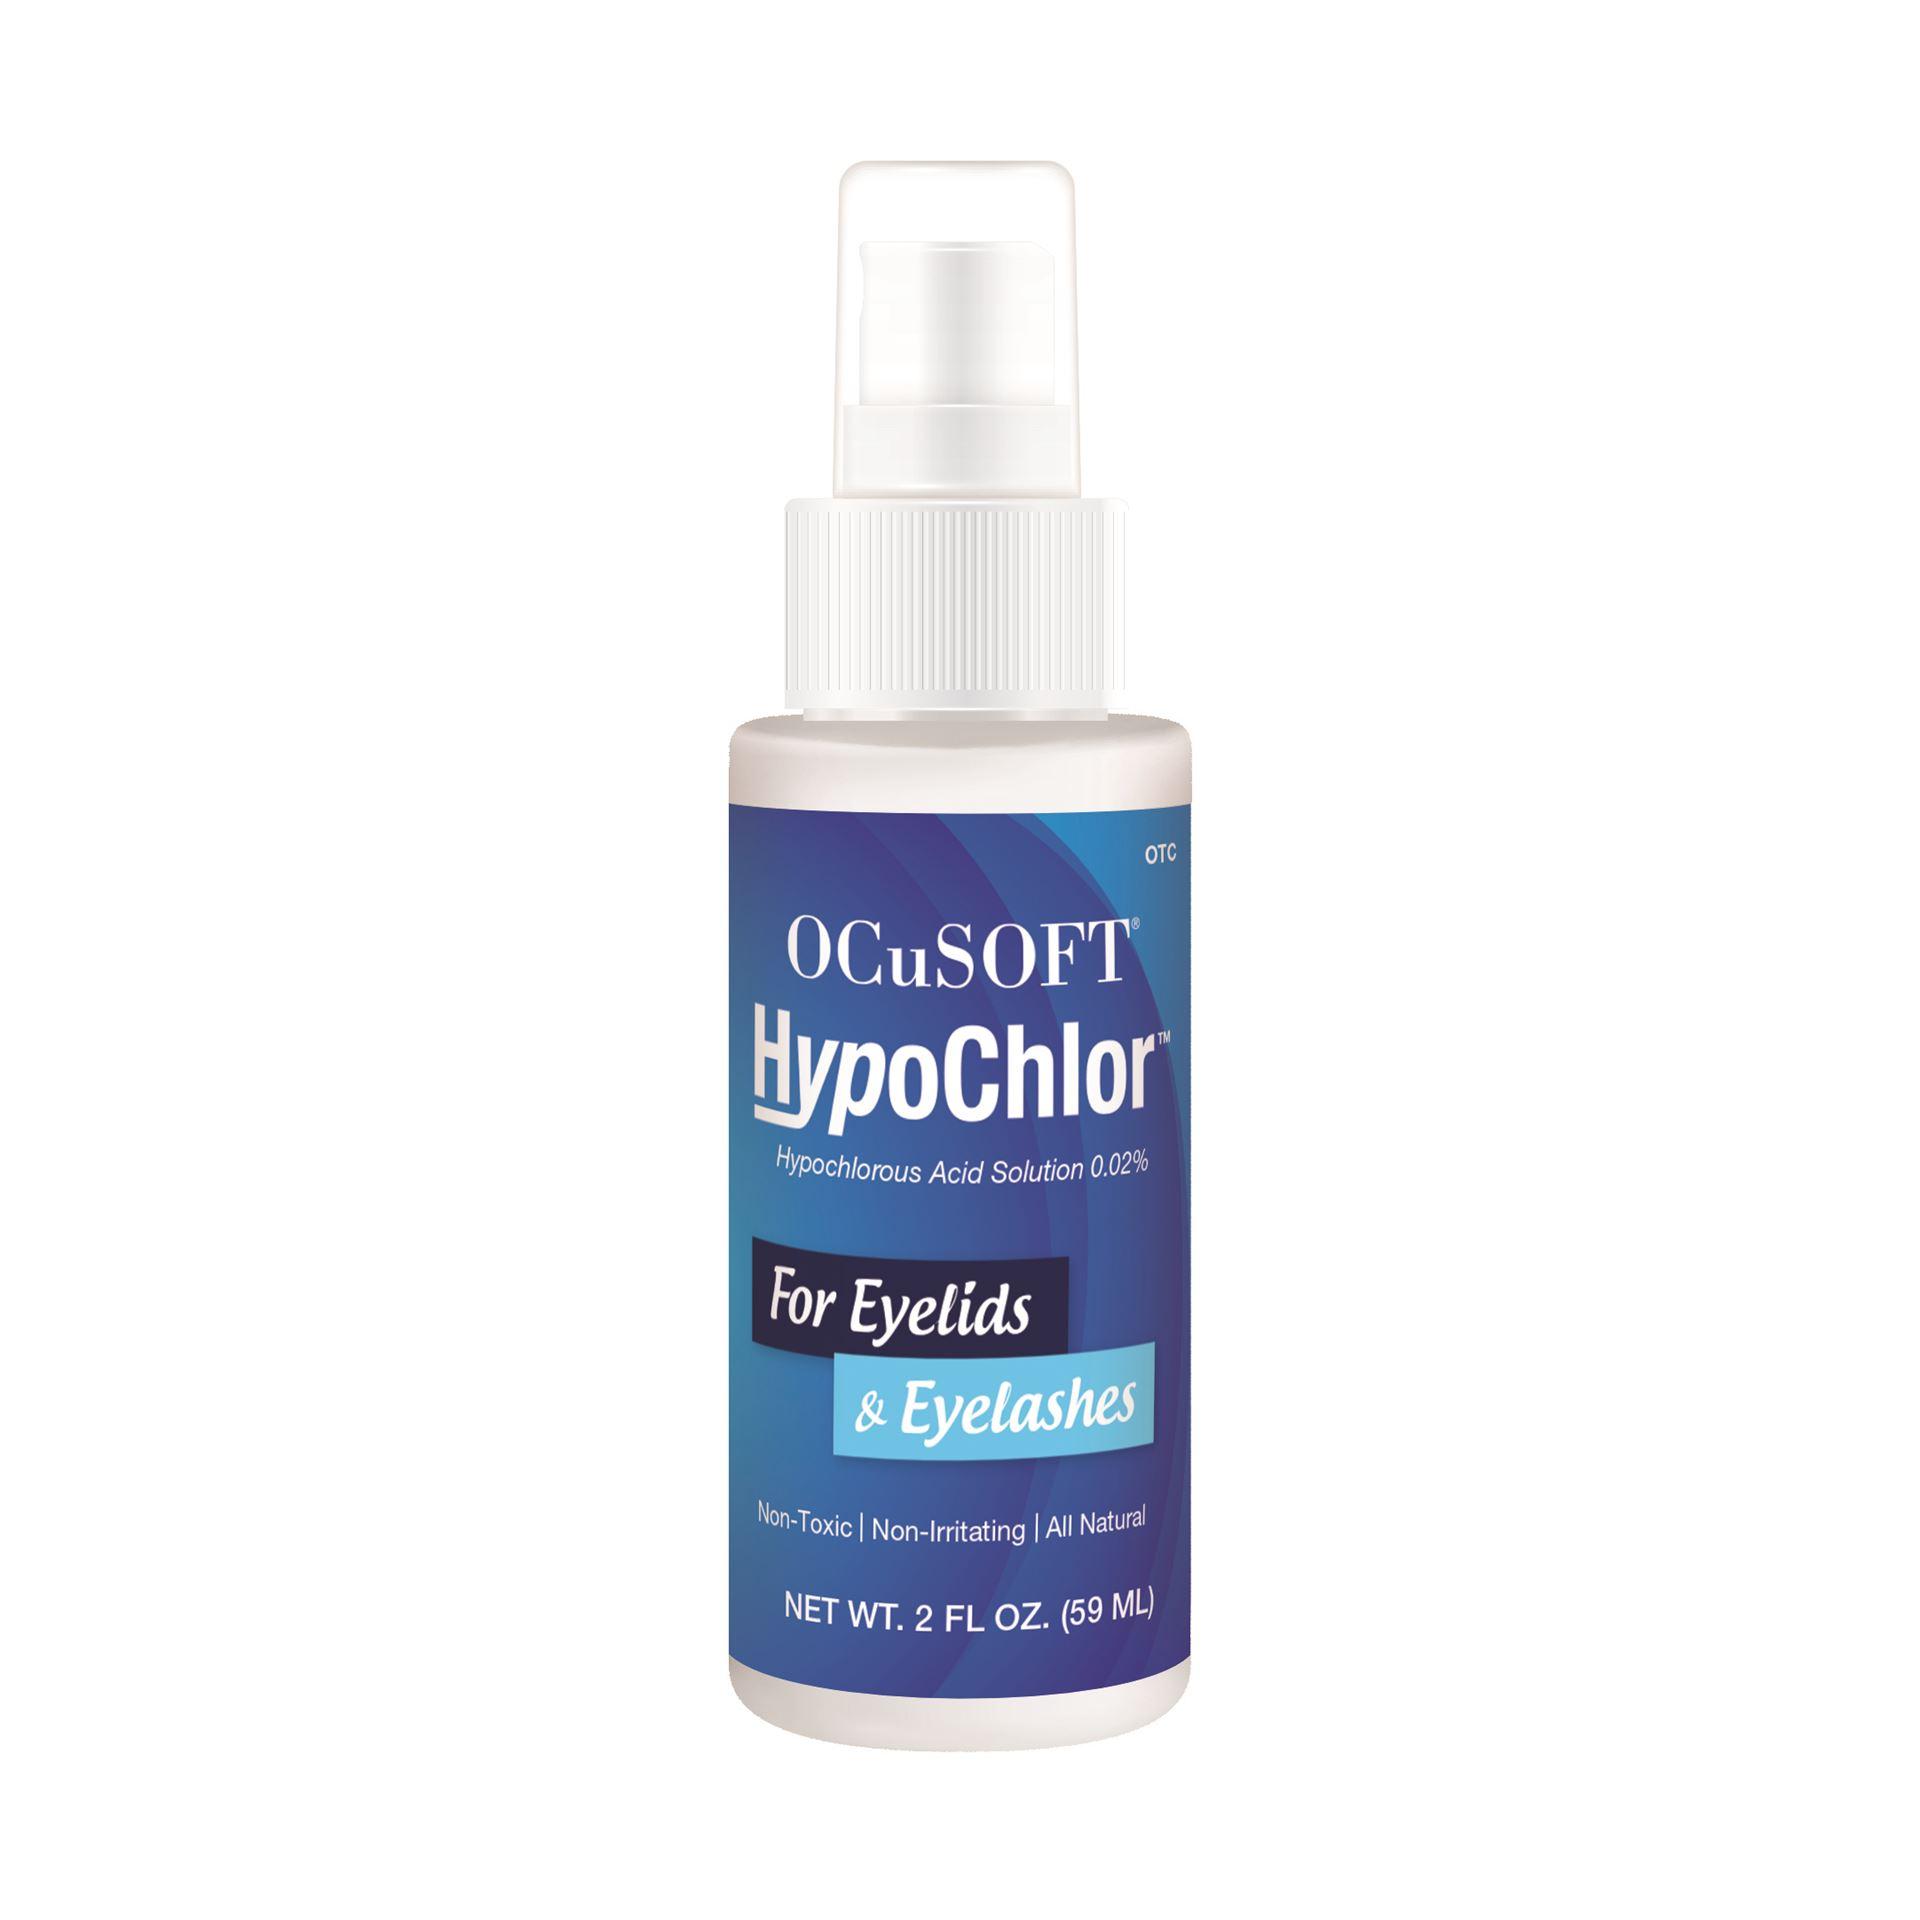 0004864_ocusoft hypochlor spray 02 2oz.jpeg